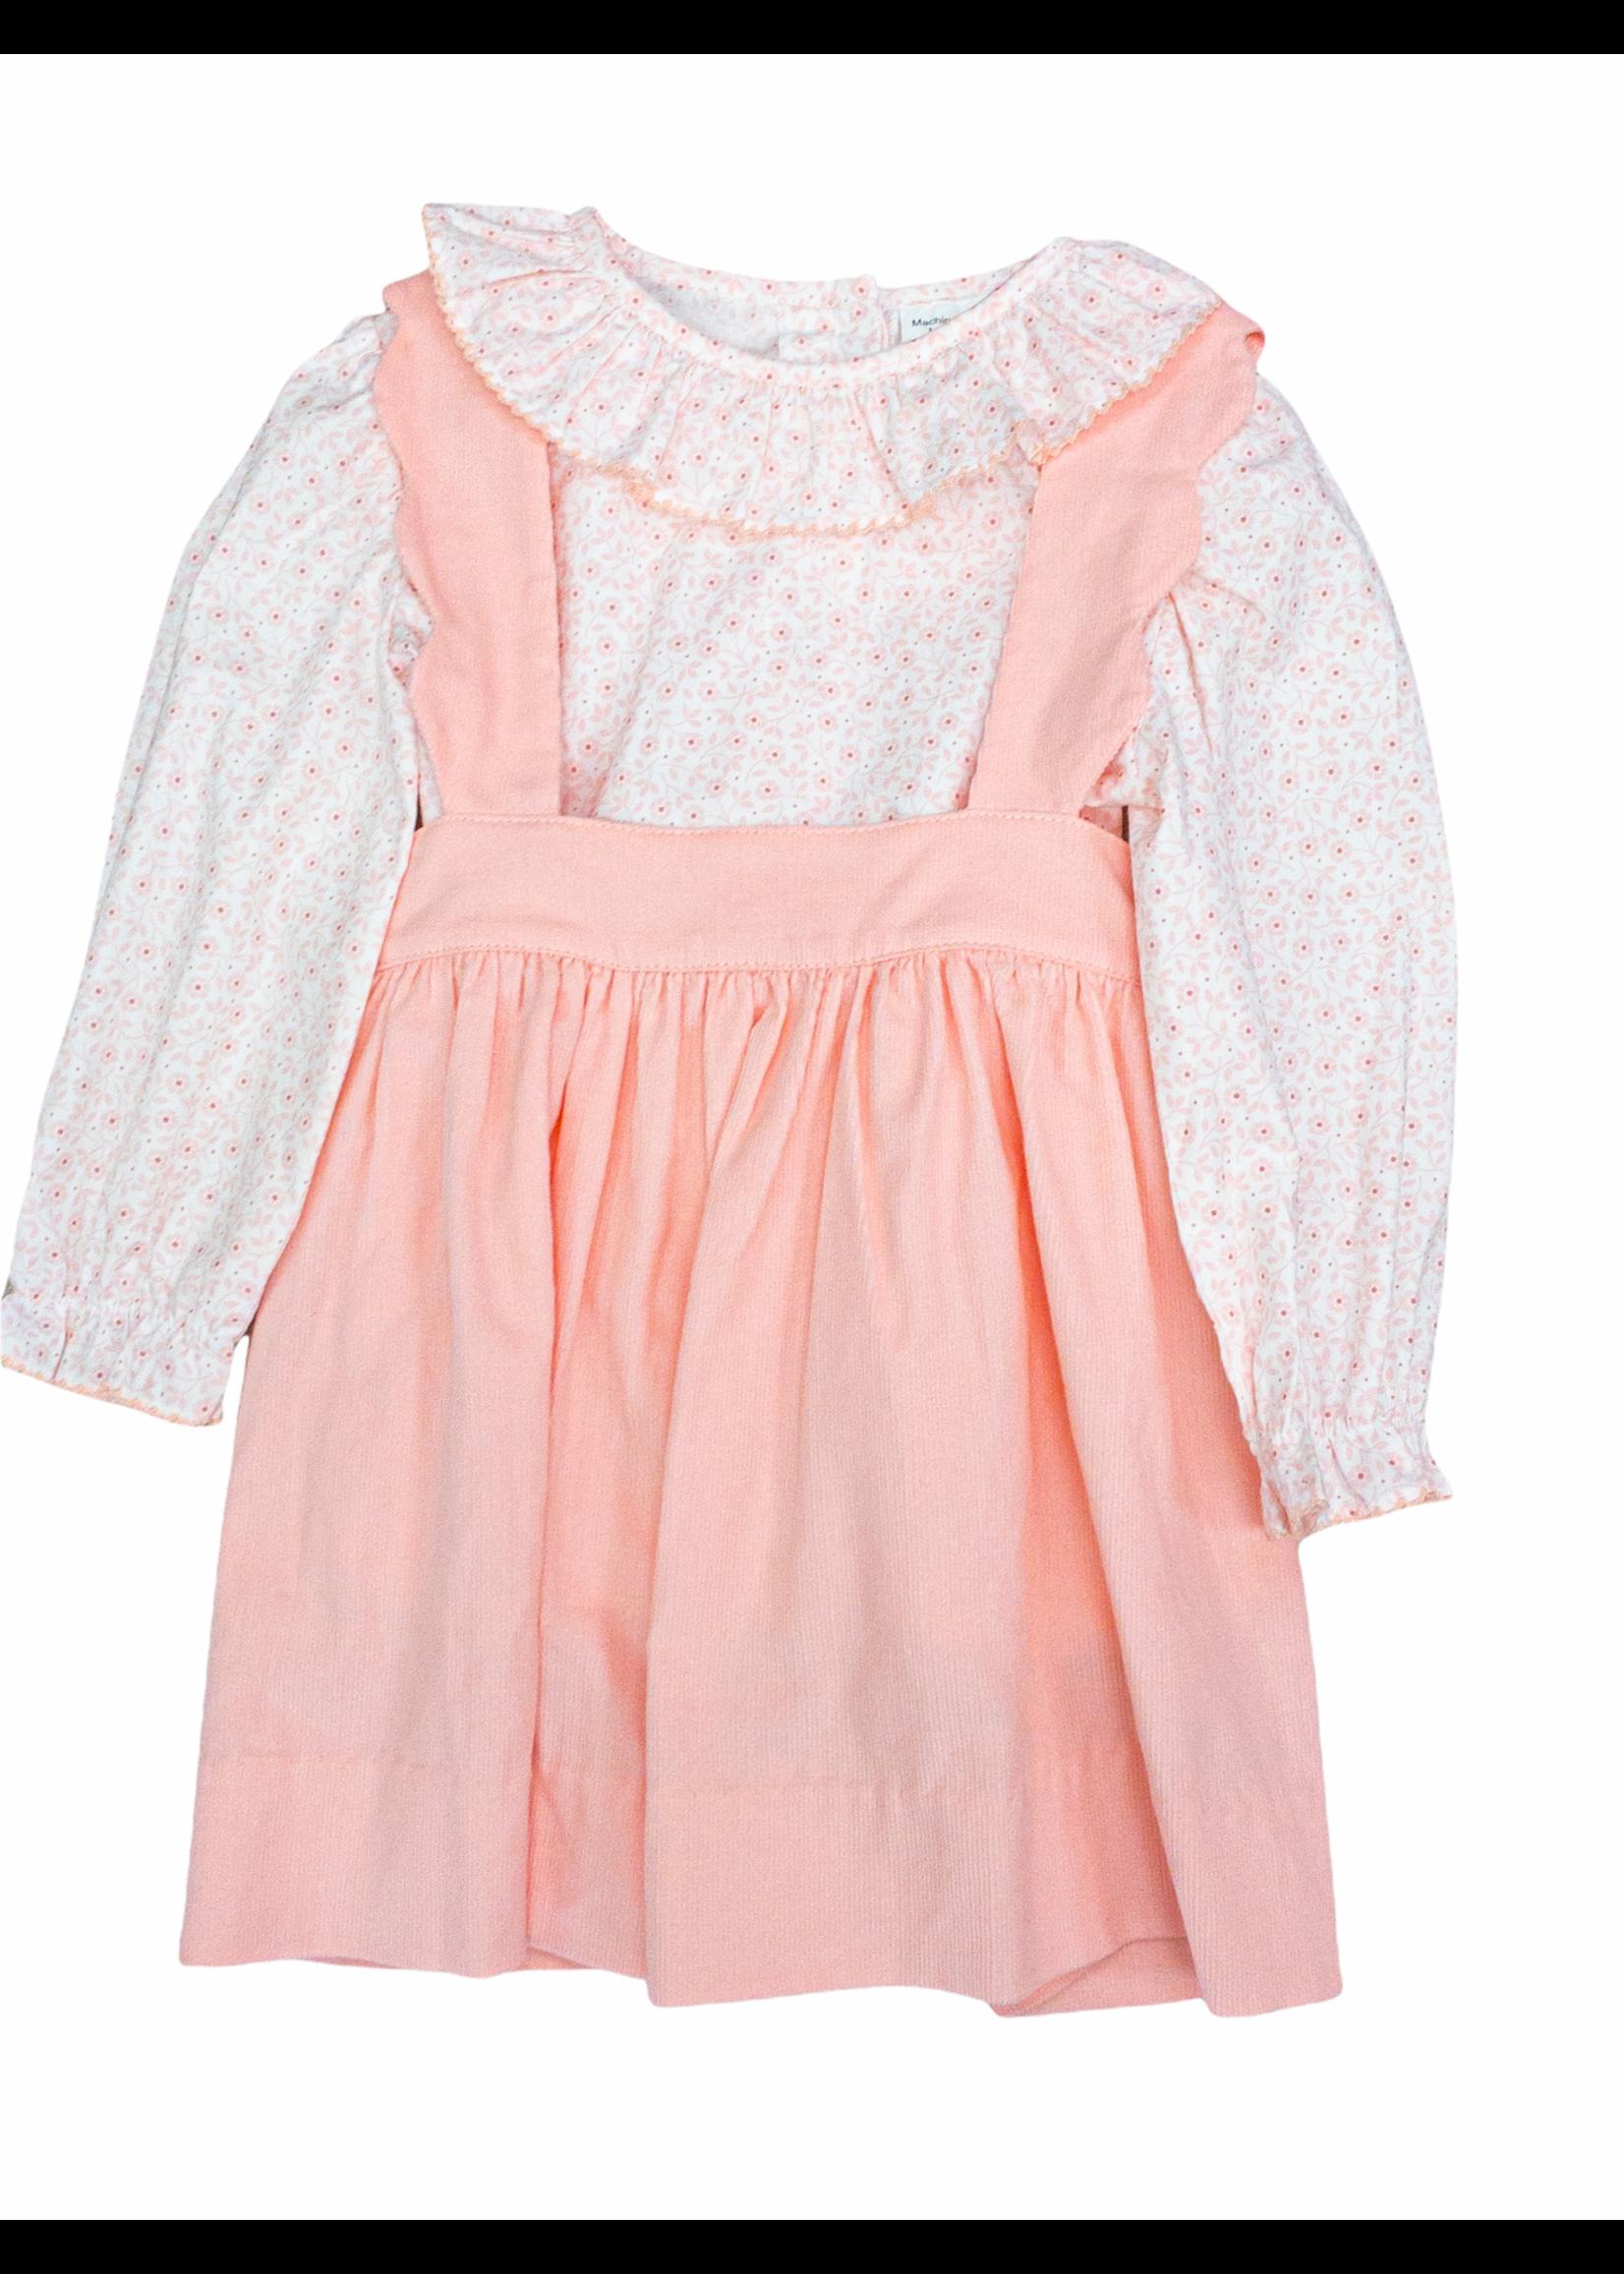 Delaney Blush Pink Cord Ruffle Blouse  Skirt Set